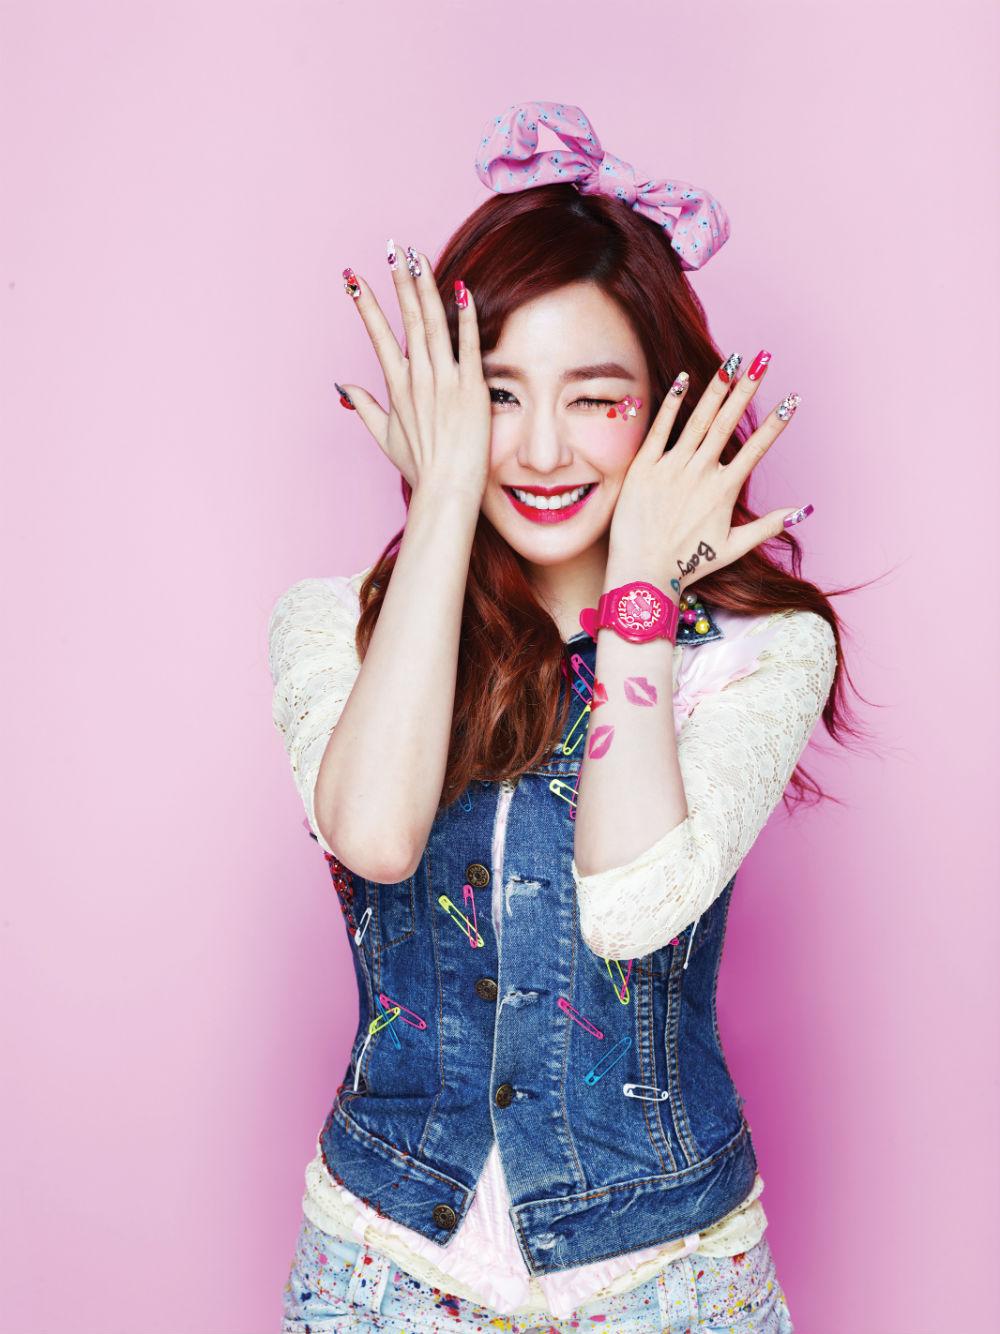 Baby-G SNSD Tiffany